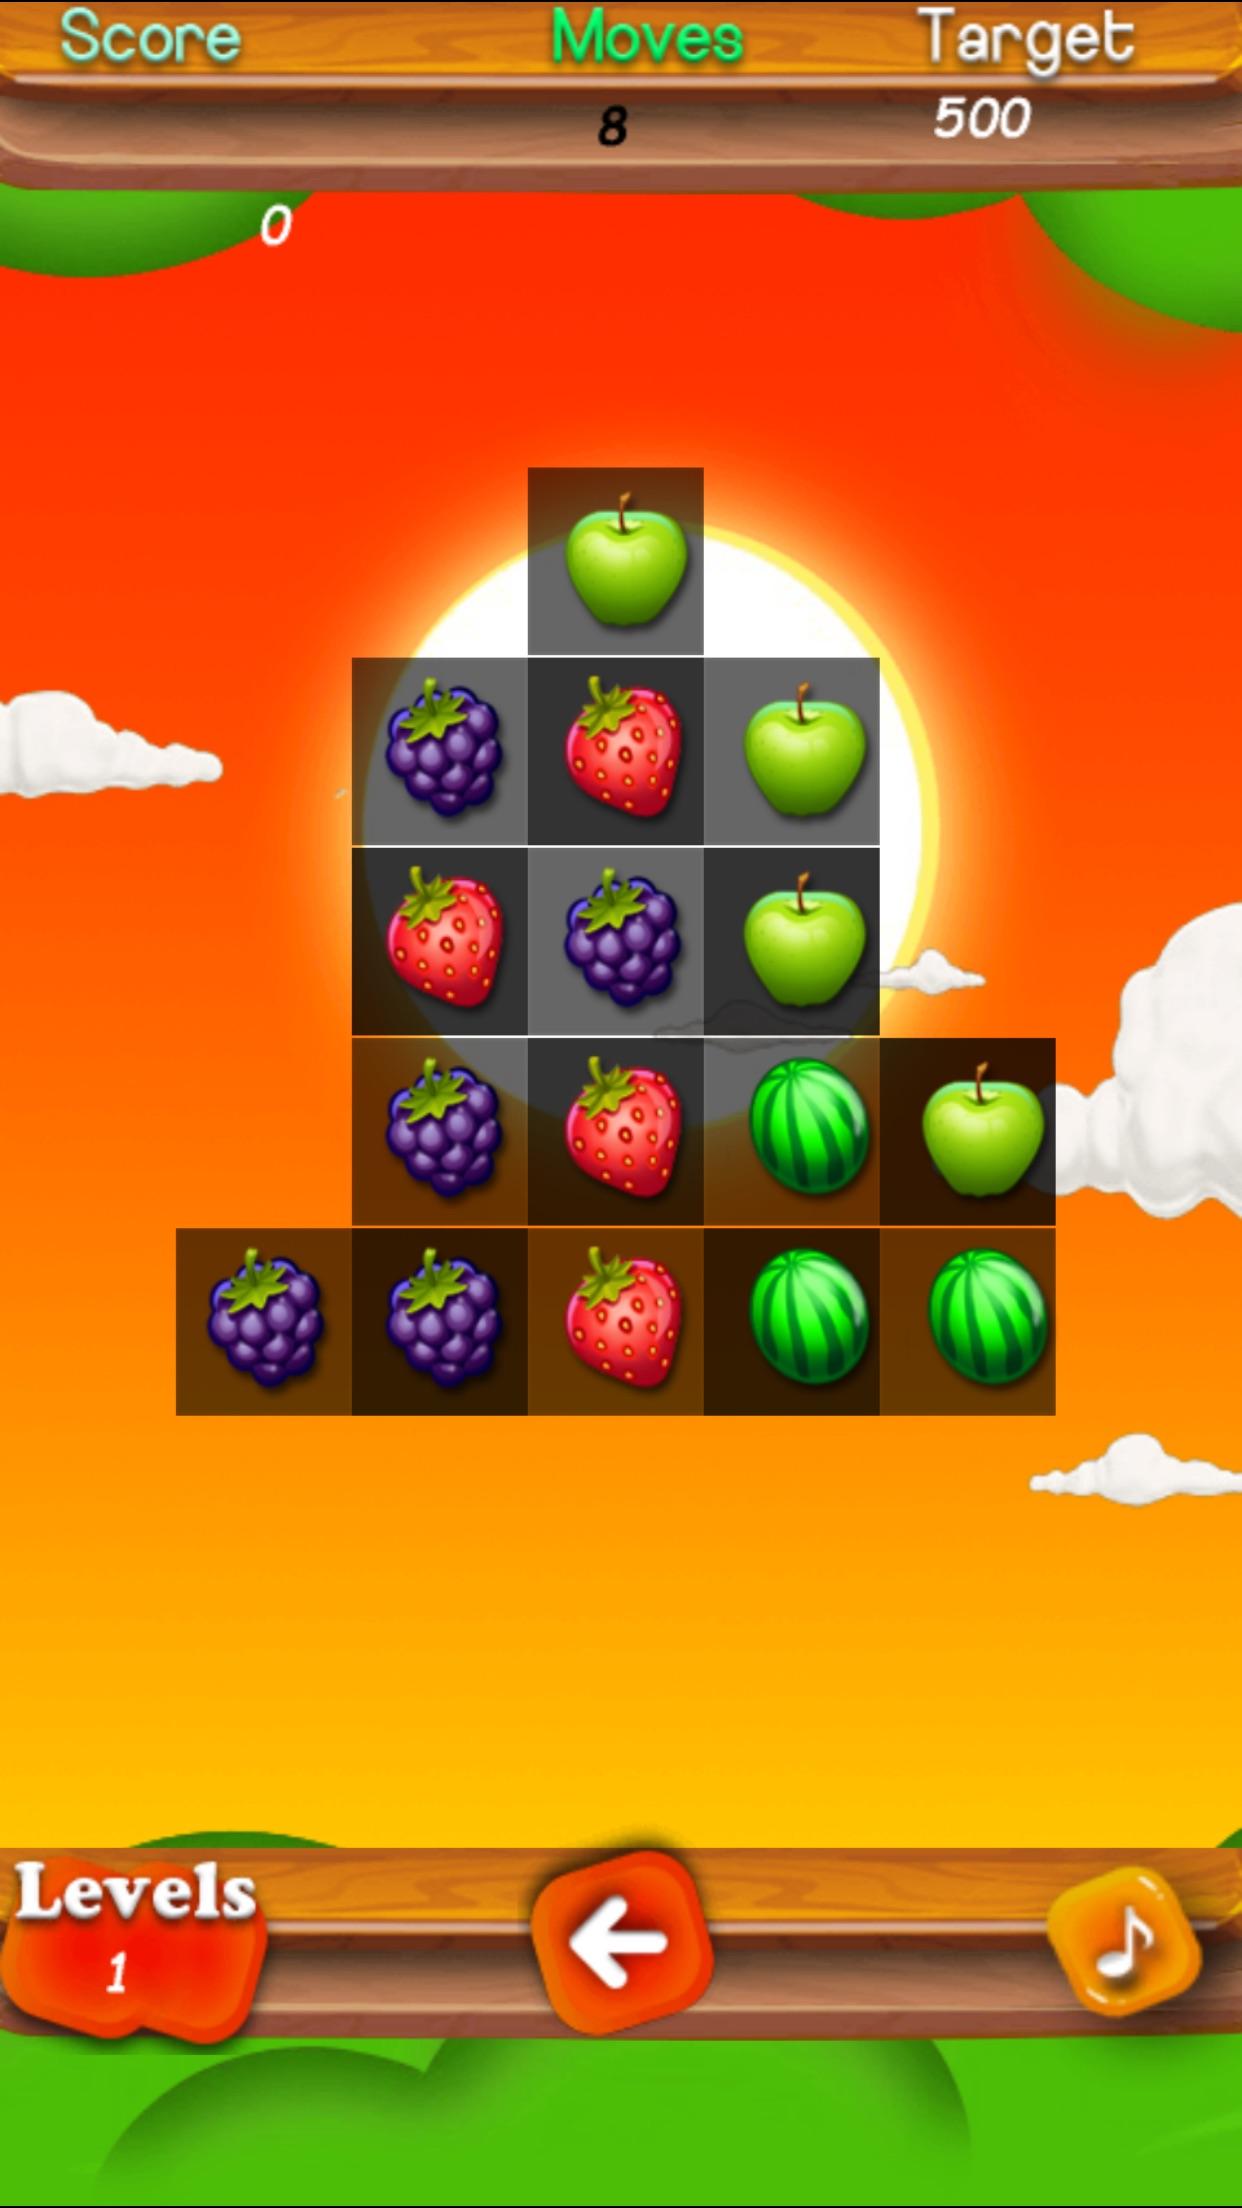 Fruit link 3 - Farm Fruit Link Screenshot 3